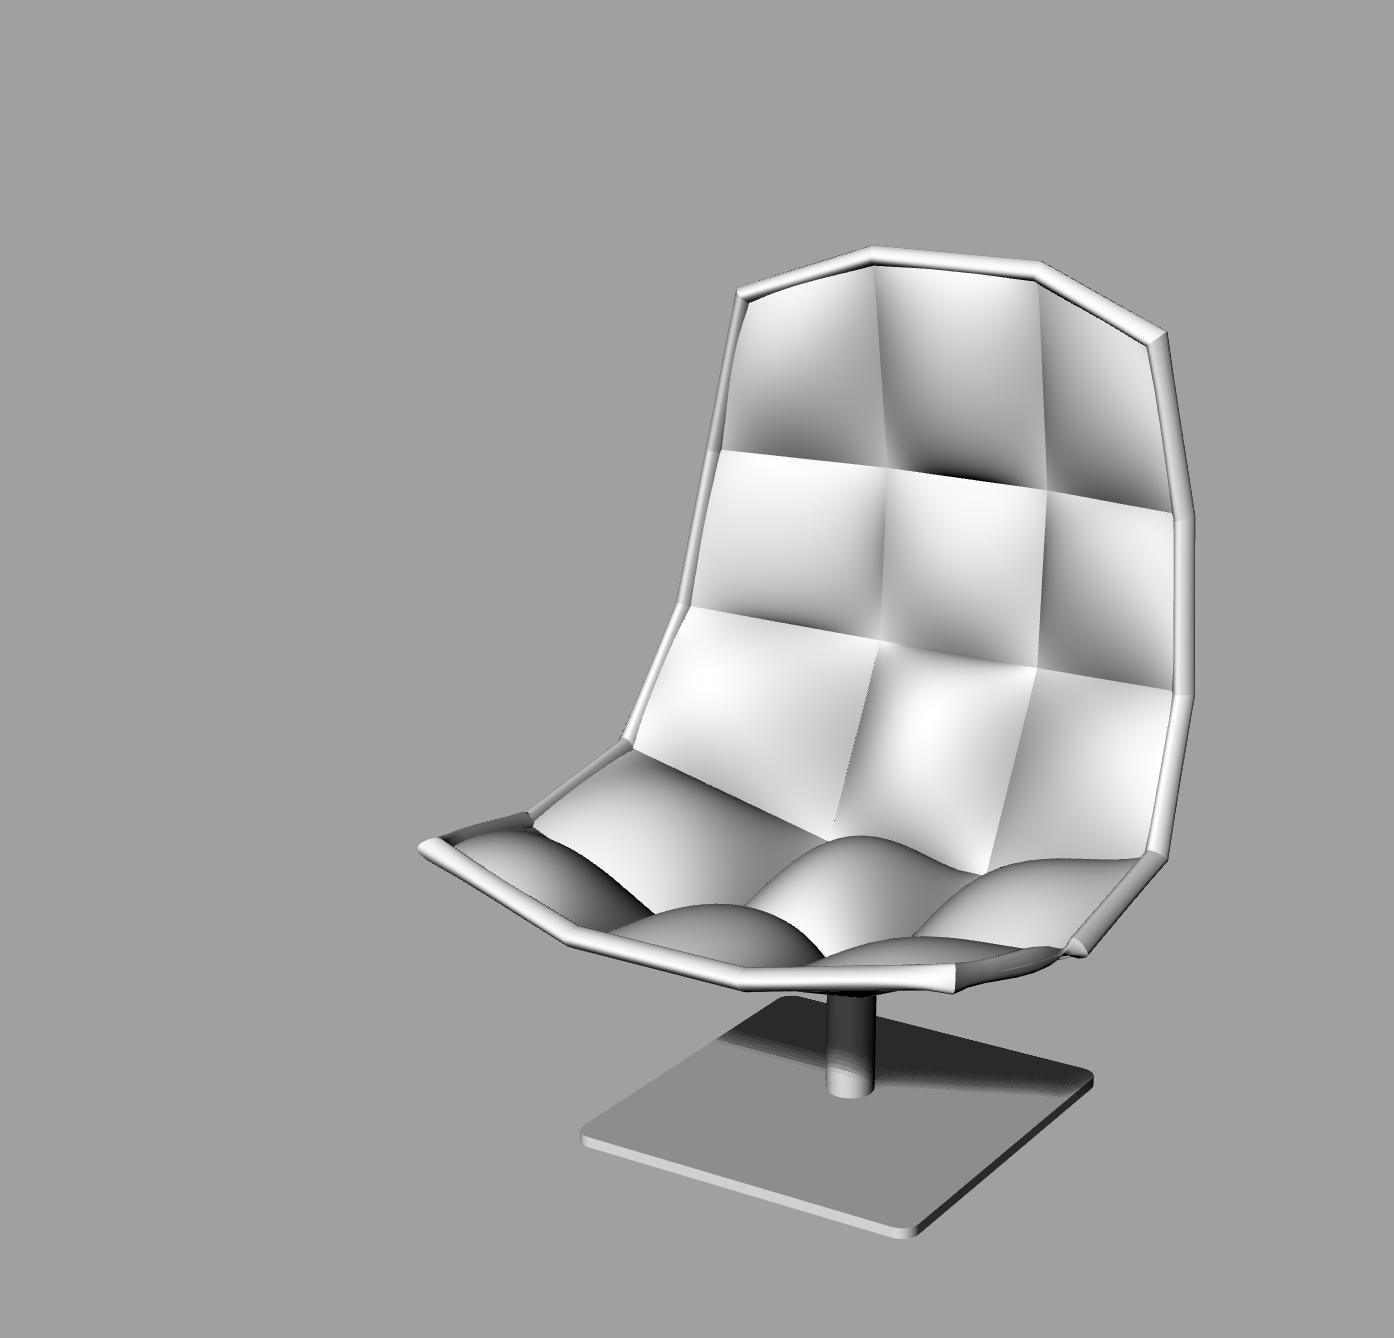 jehs laub lounge chair walmart adirondack chairs plastic parametric seating part i 43laub by knoll